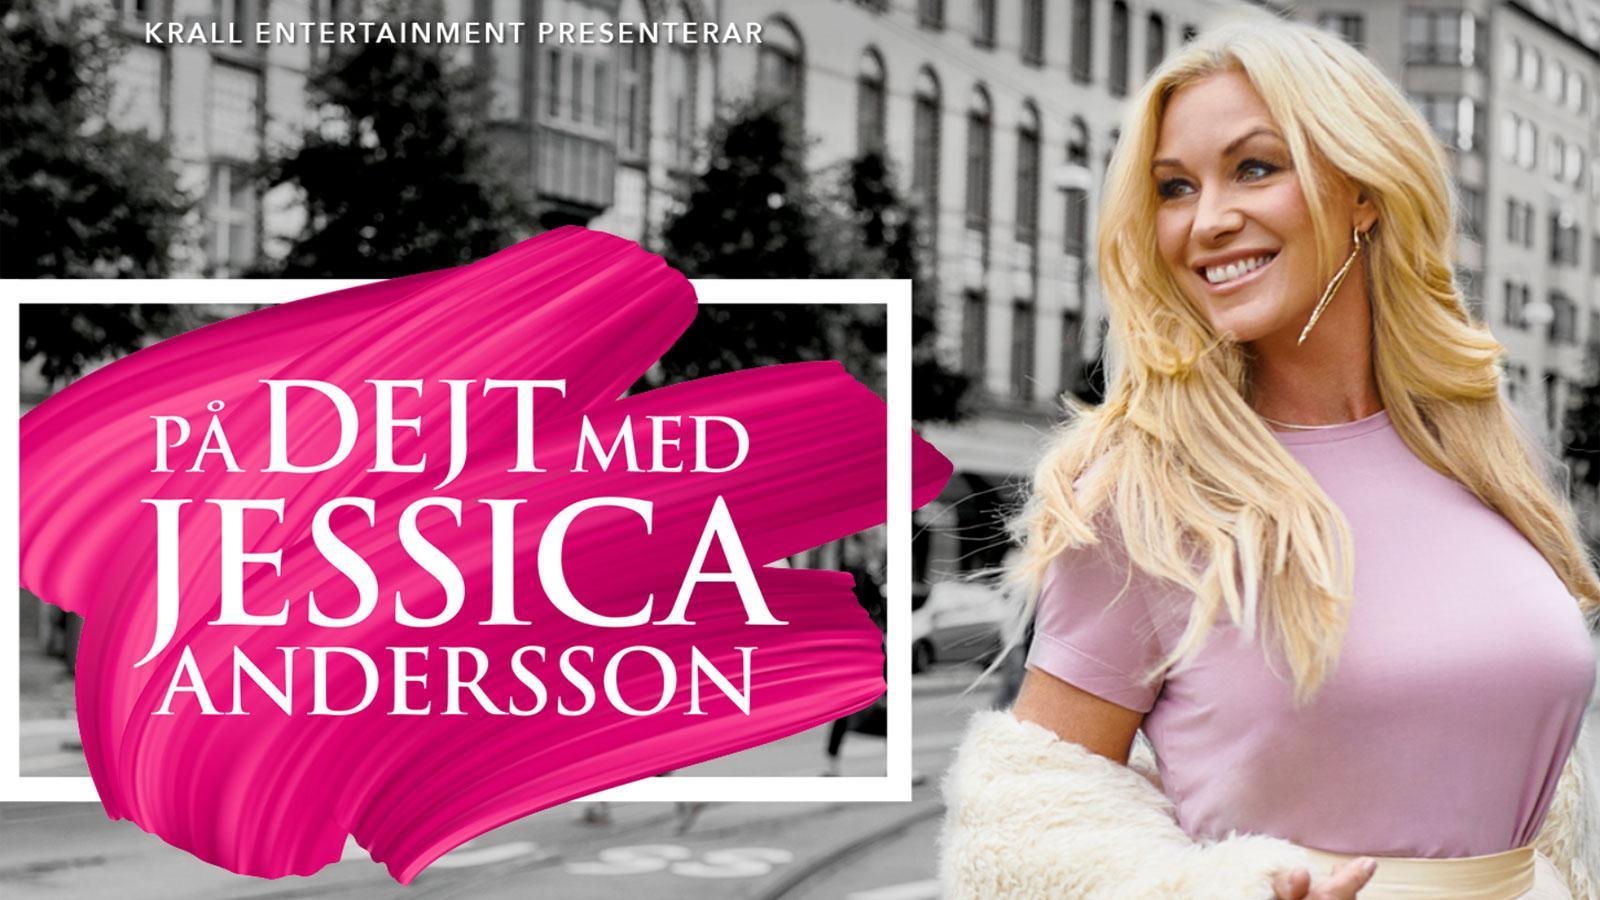 Eva Johansson, Grnns 195, Skepplanda | omr-scanner.net